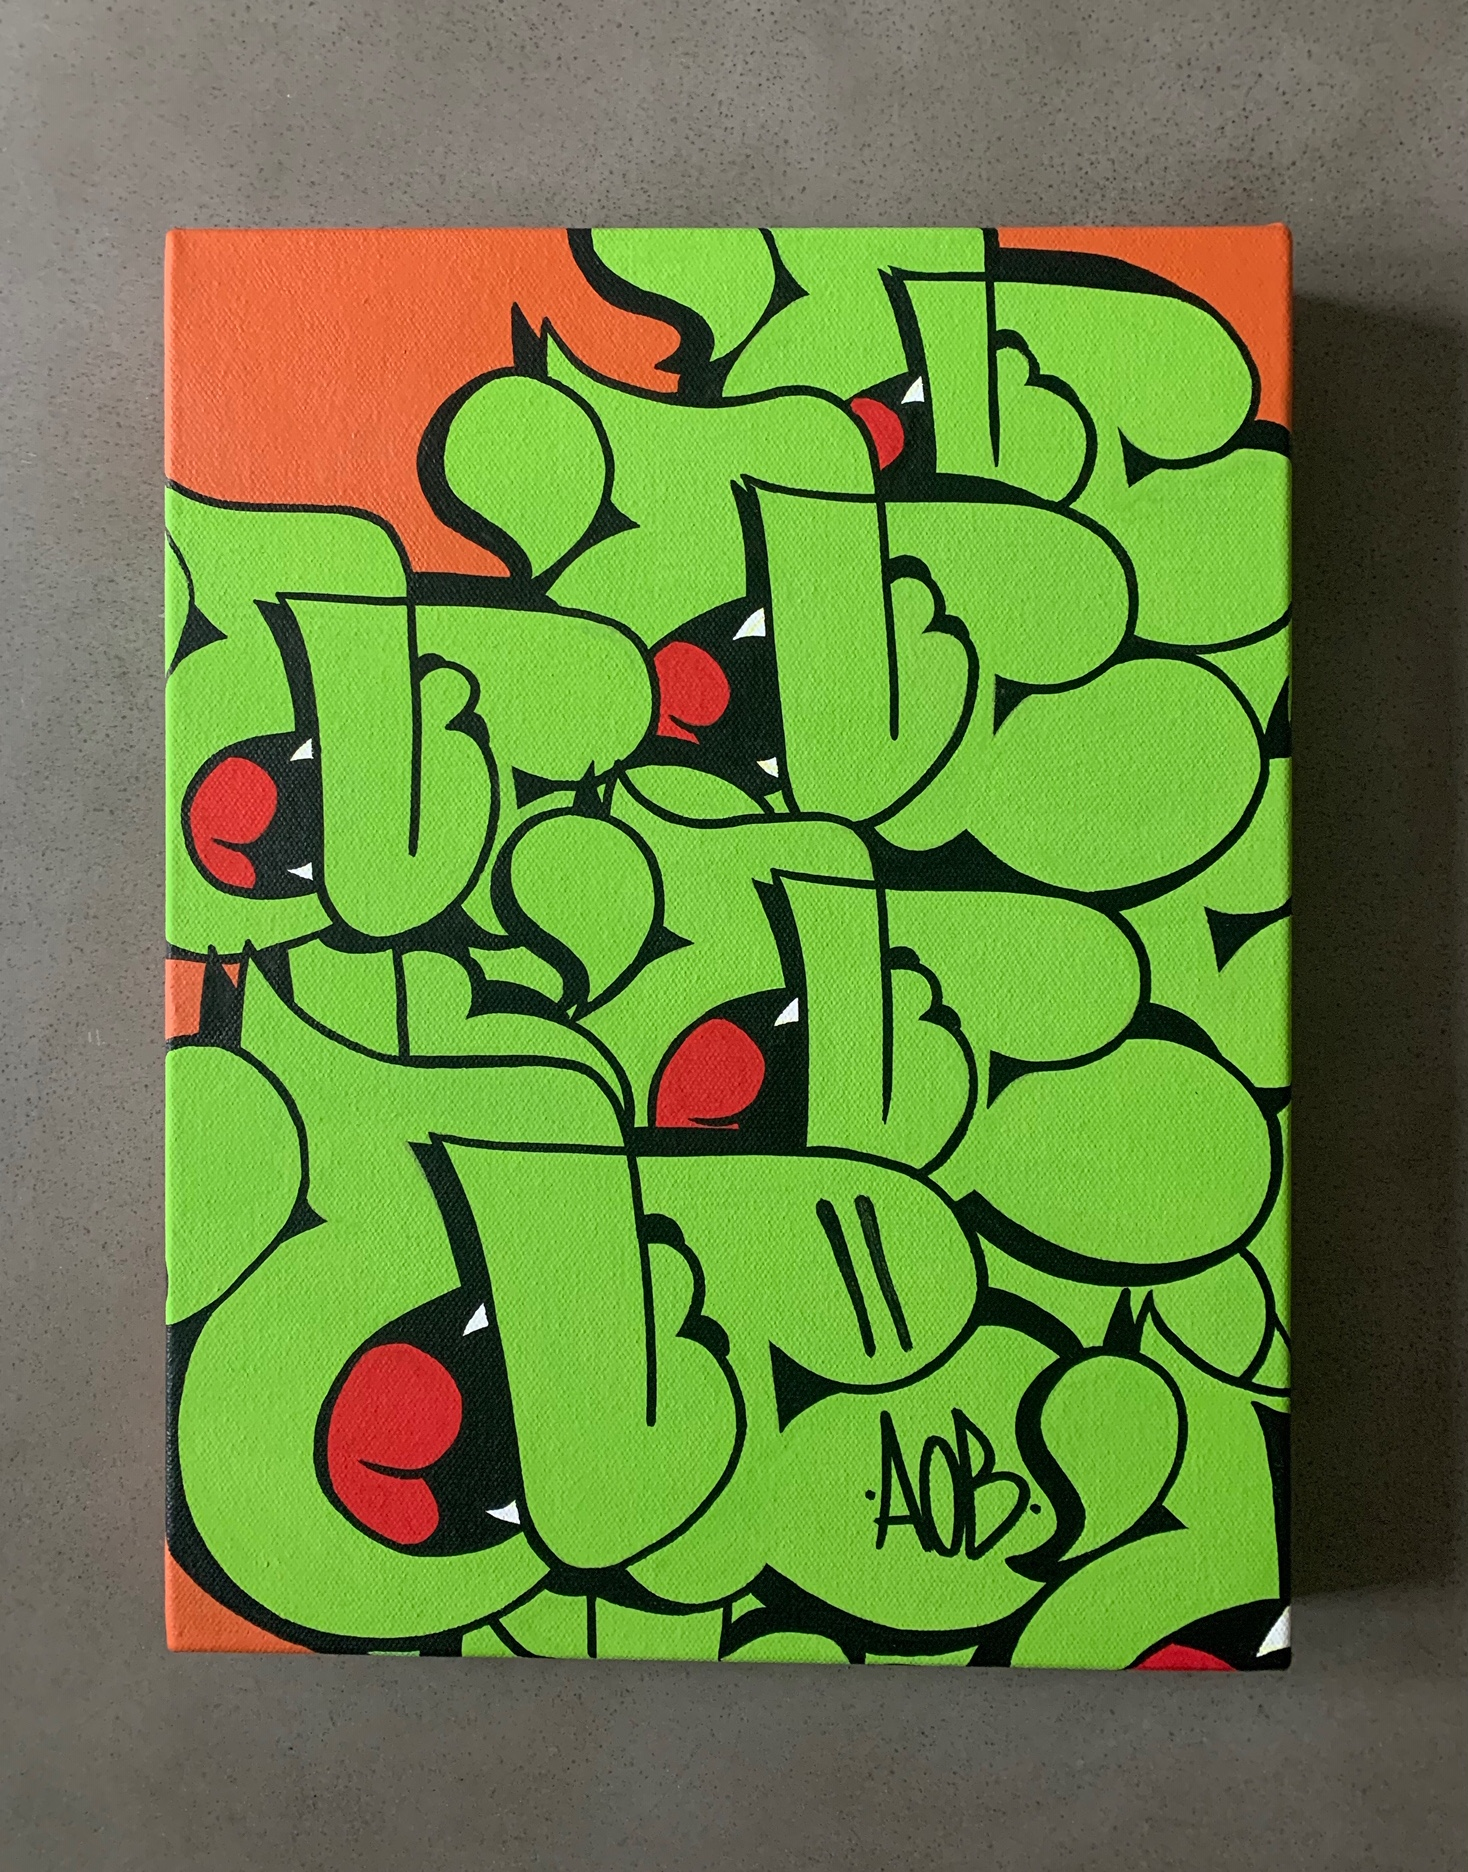 11x14' Nover Green Throwie Canvas, 2019.